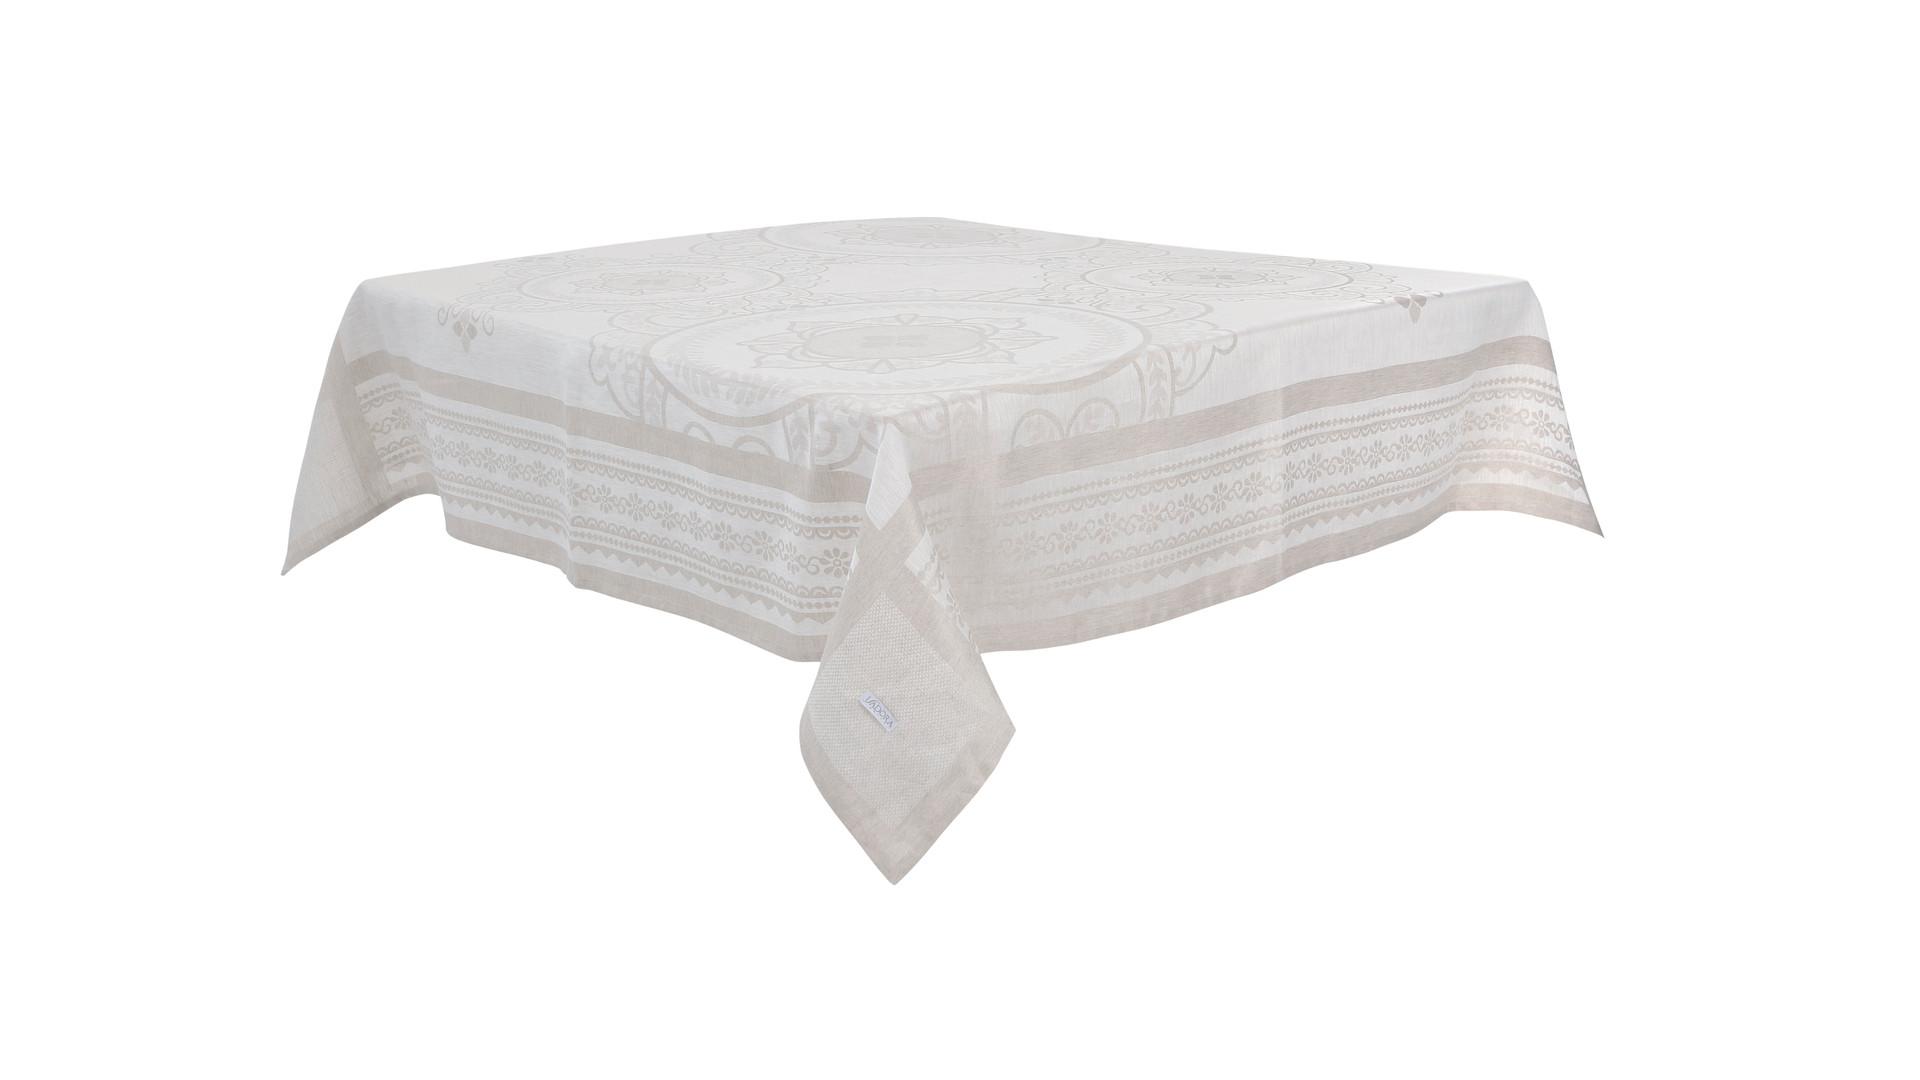 80001 a 80003 - Toalha de Mesa Isadora P